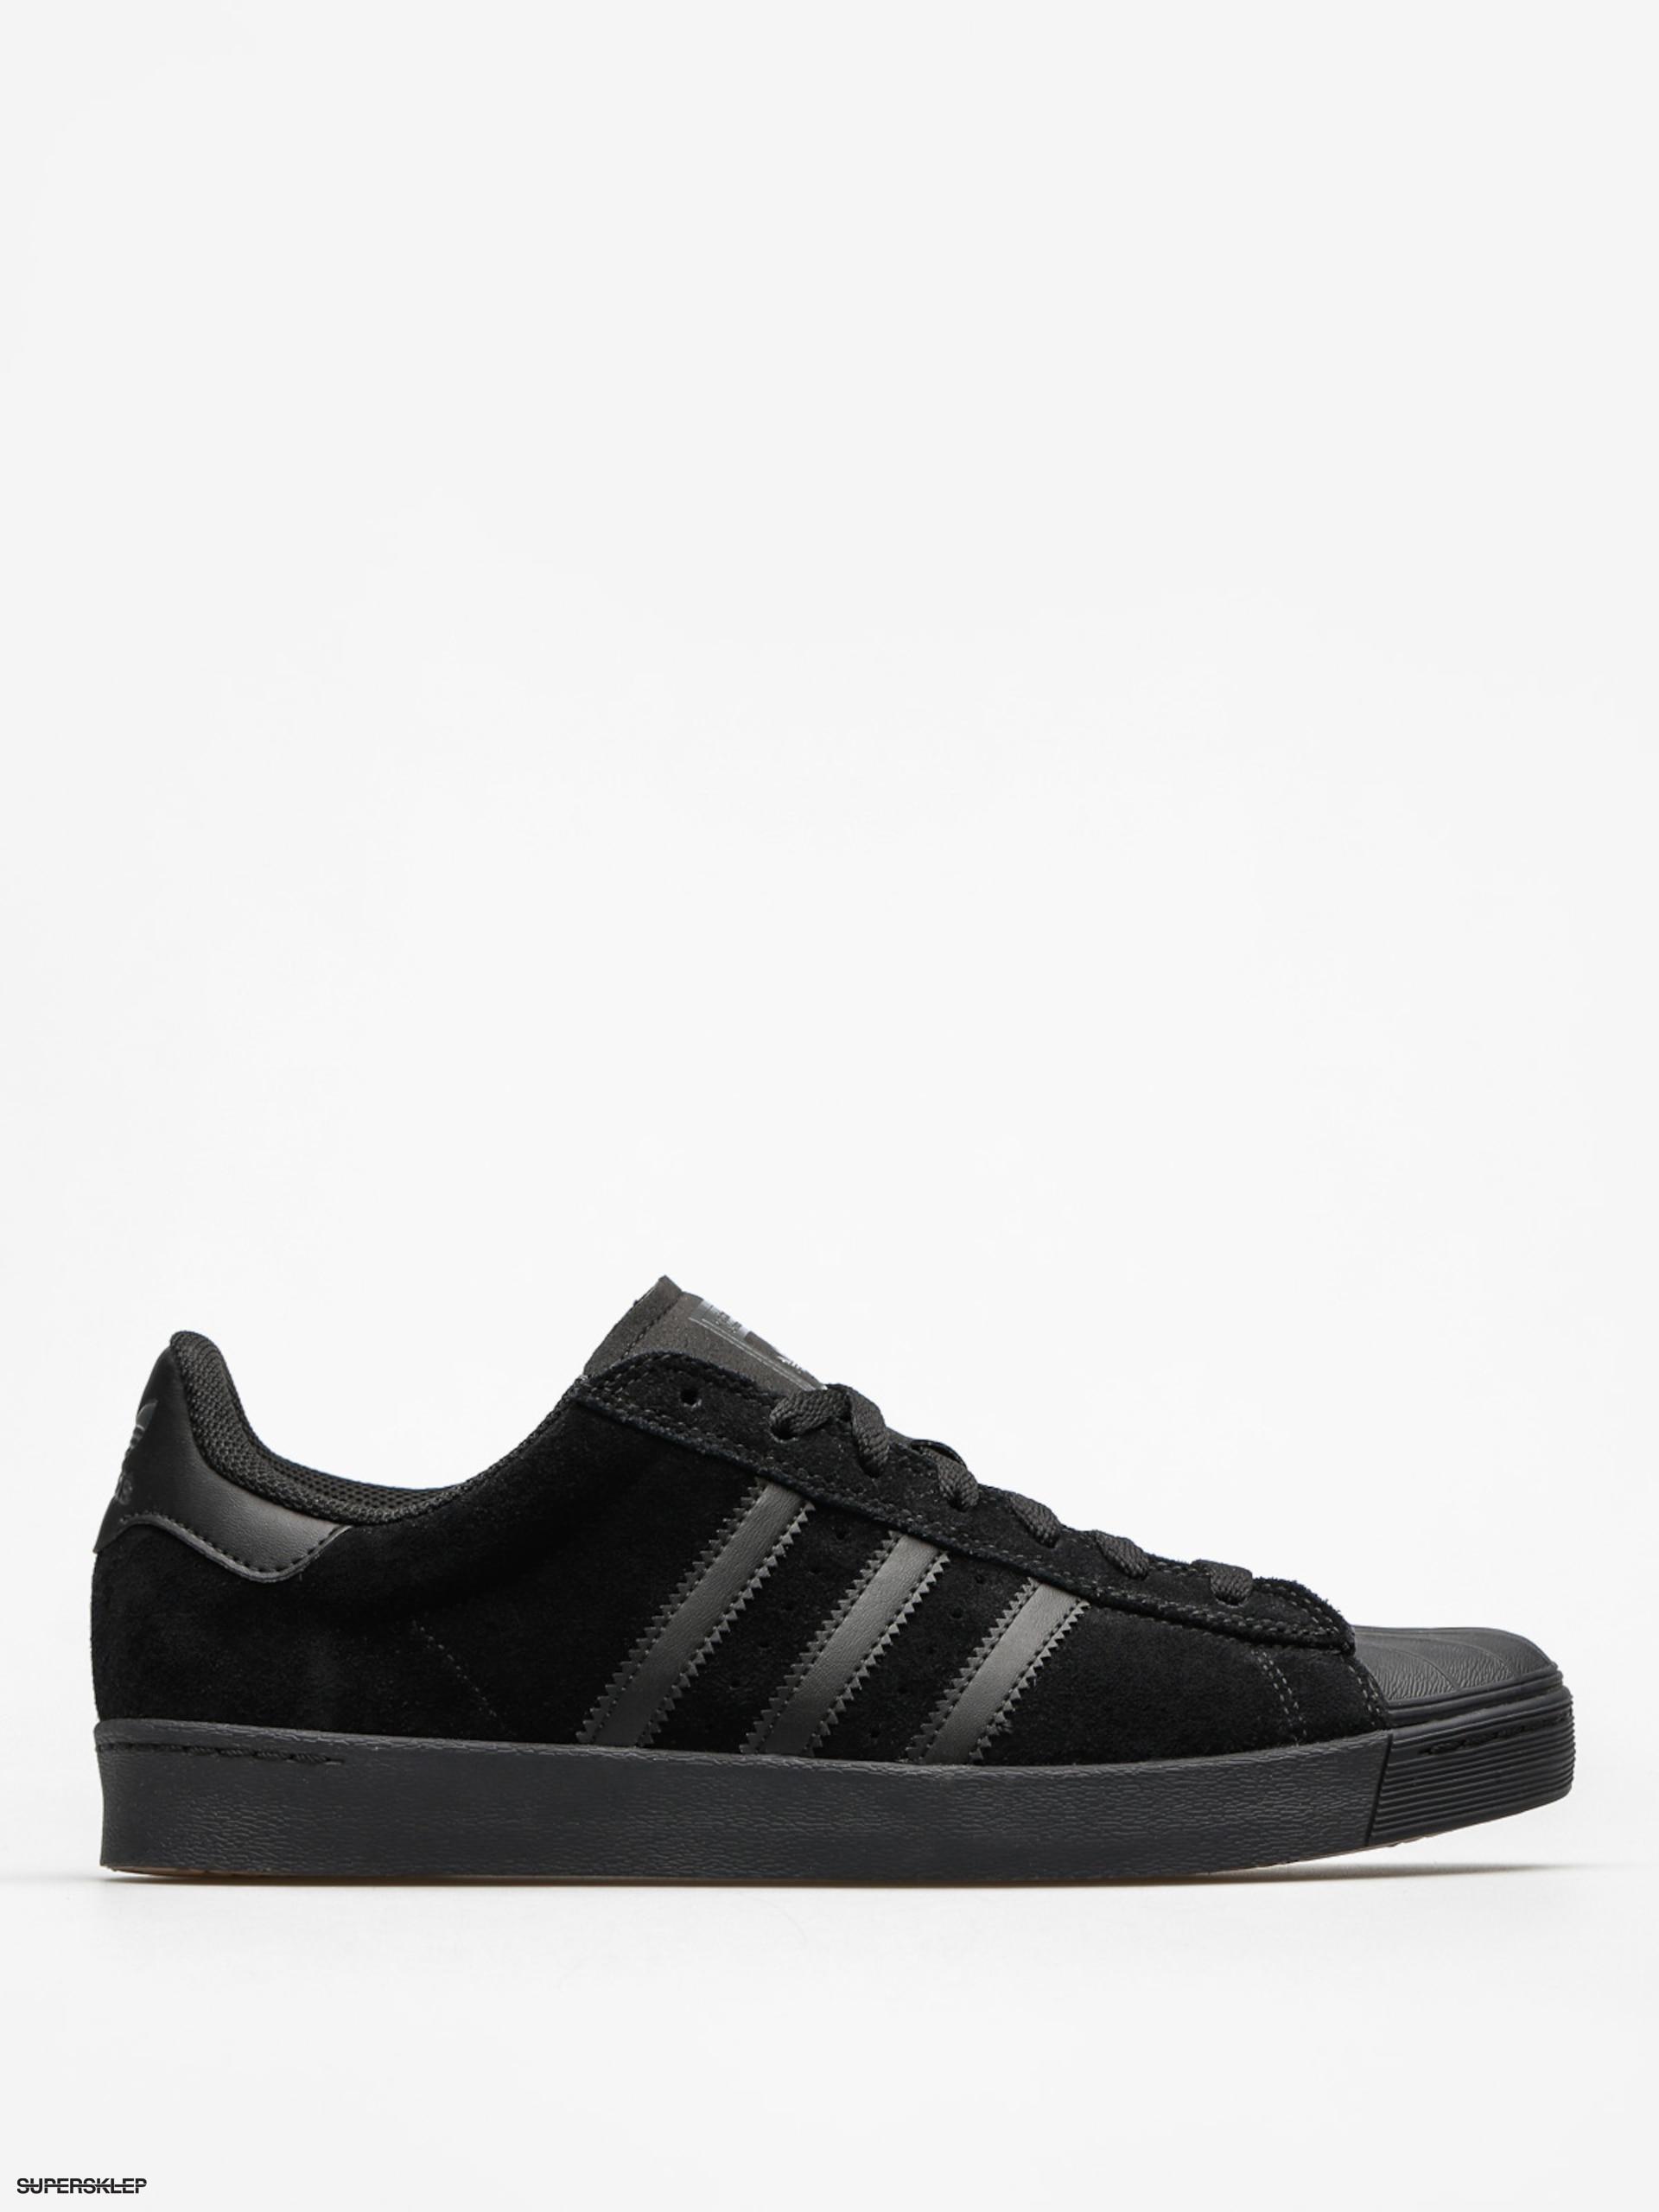 a56761fa71 Topánky adidas Superstar Vulc Adv (core black core black core black)